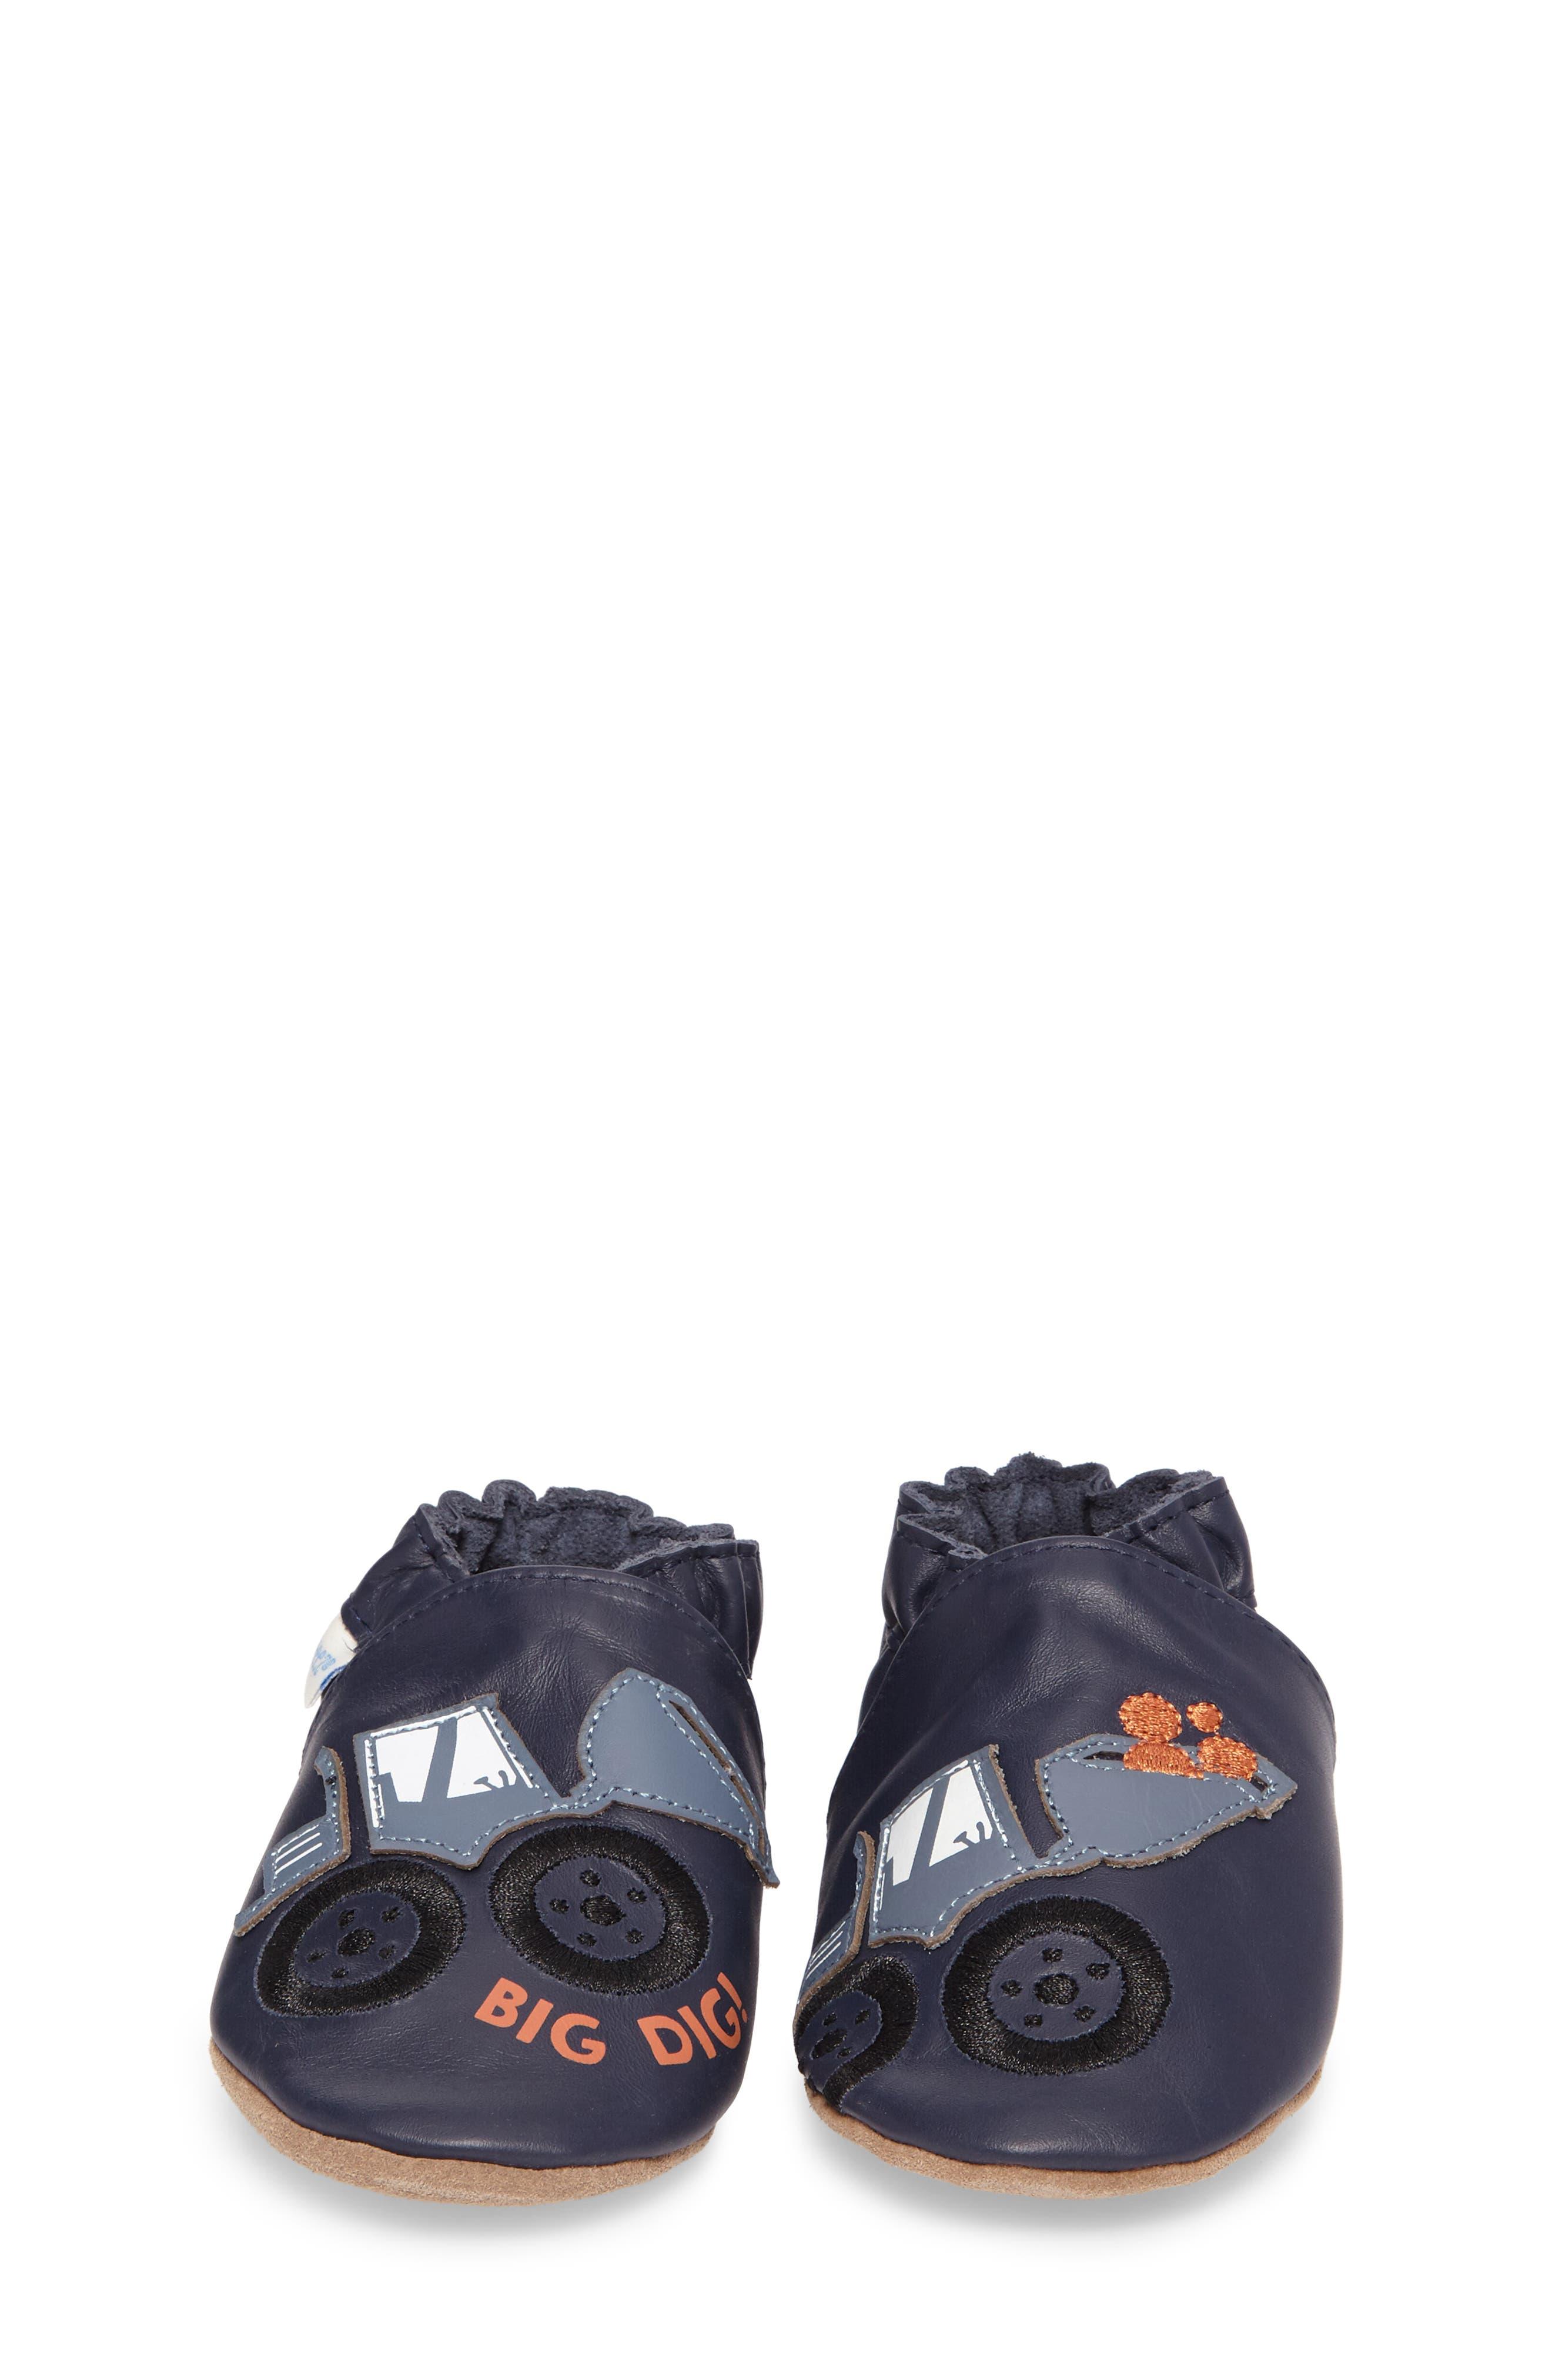 Big Dig Crib Shoe,                             Alternate thumbnail 4, color,                             410